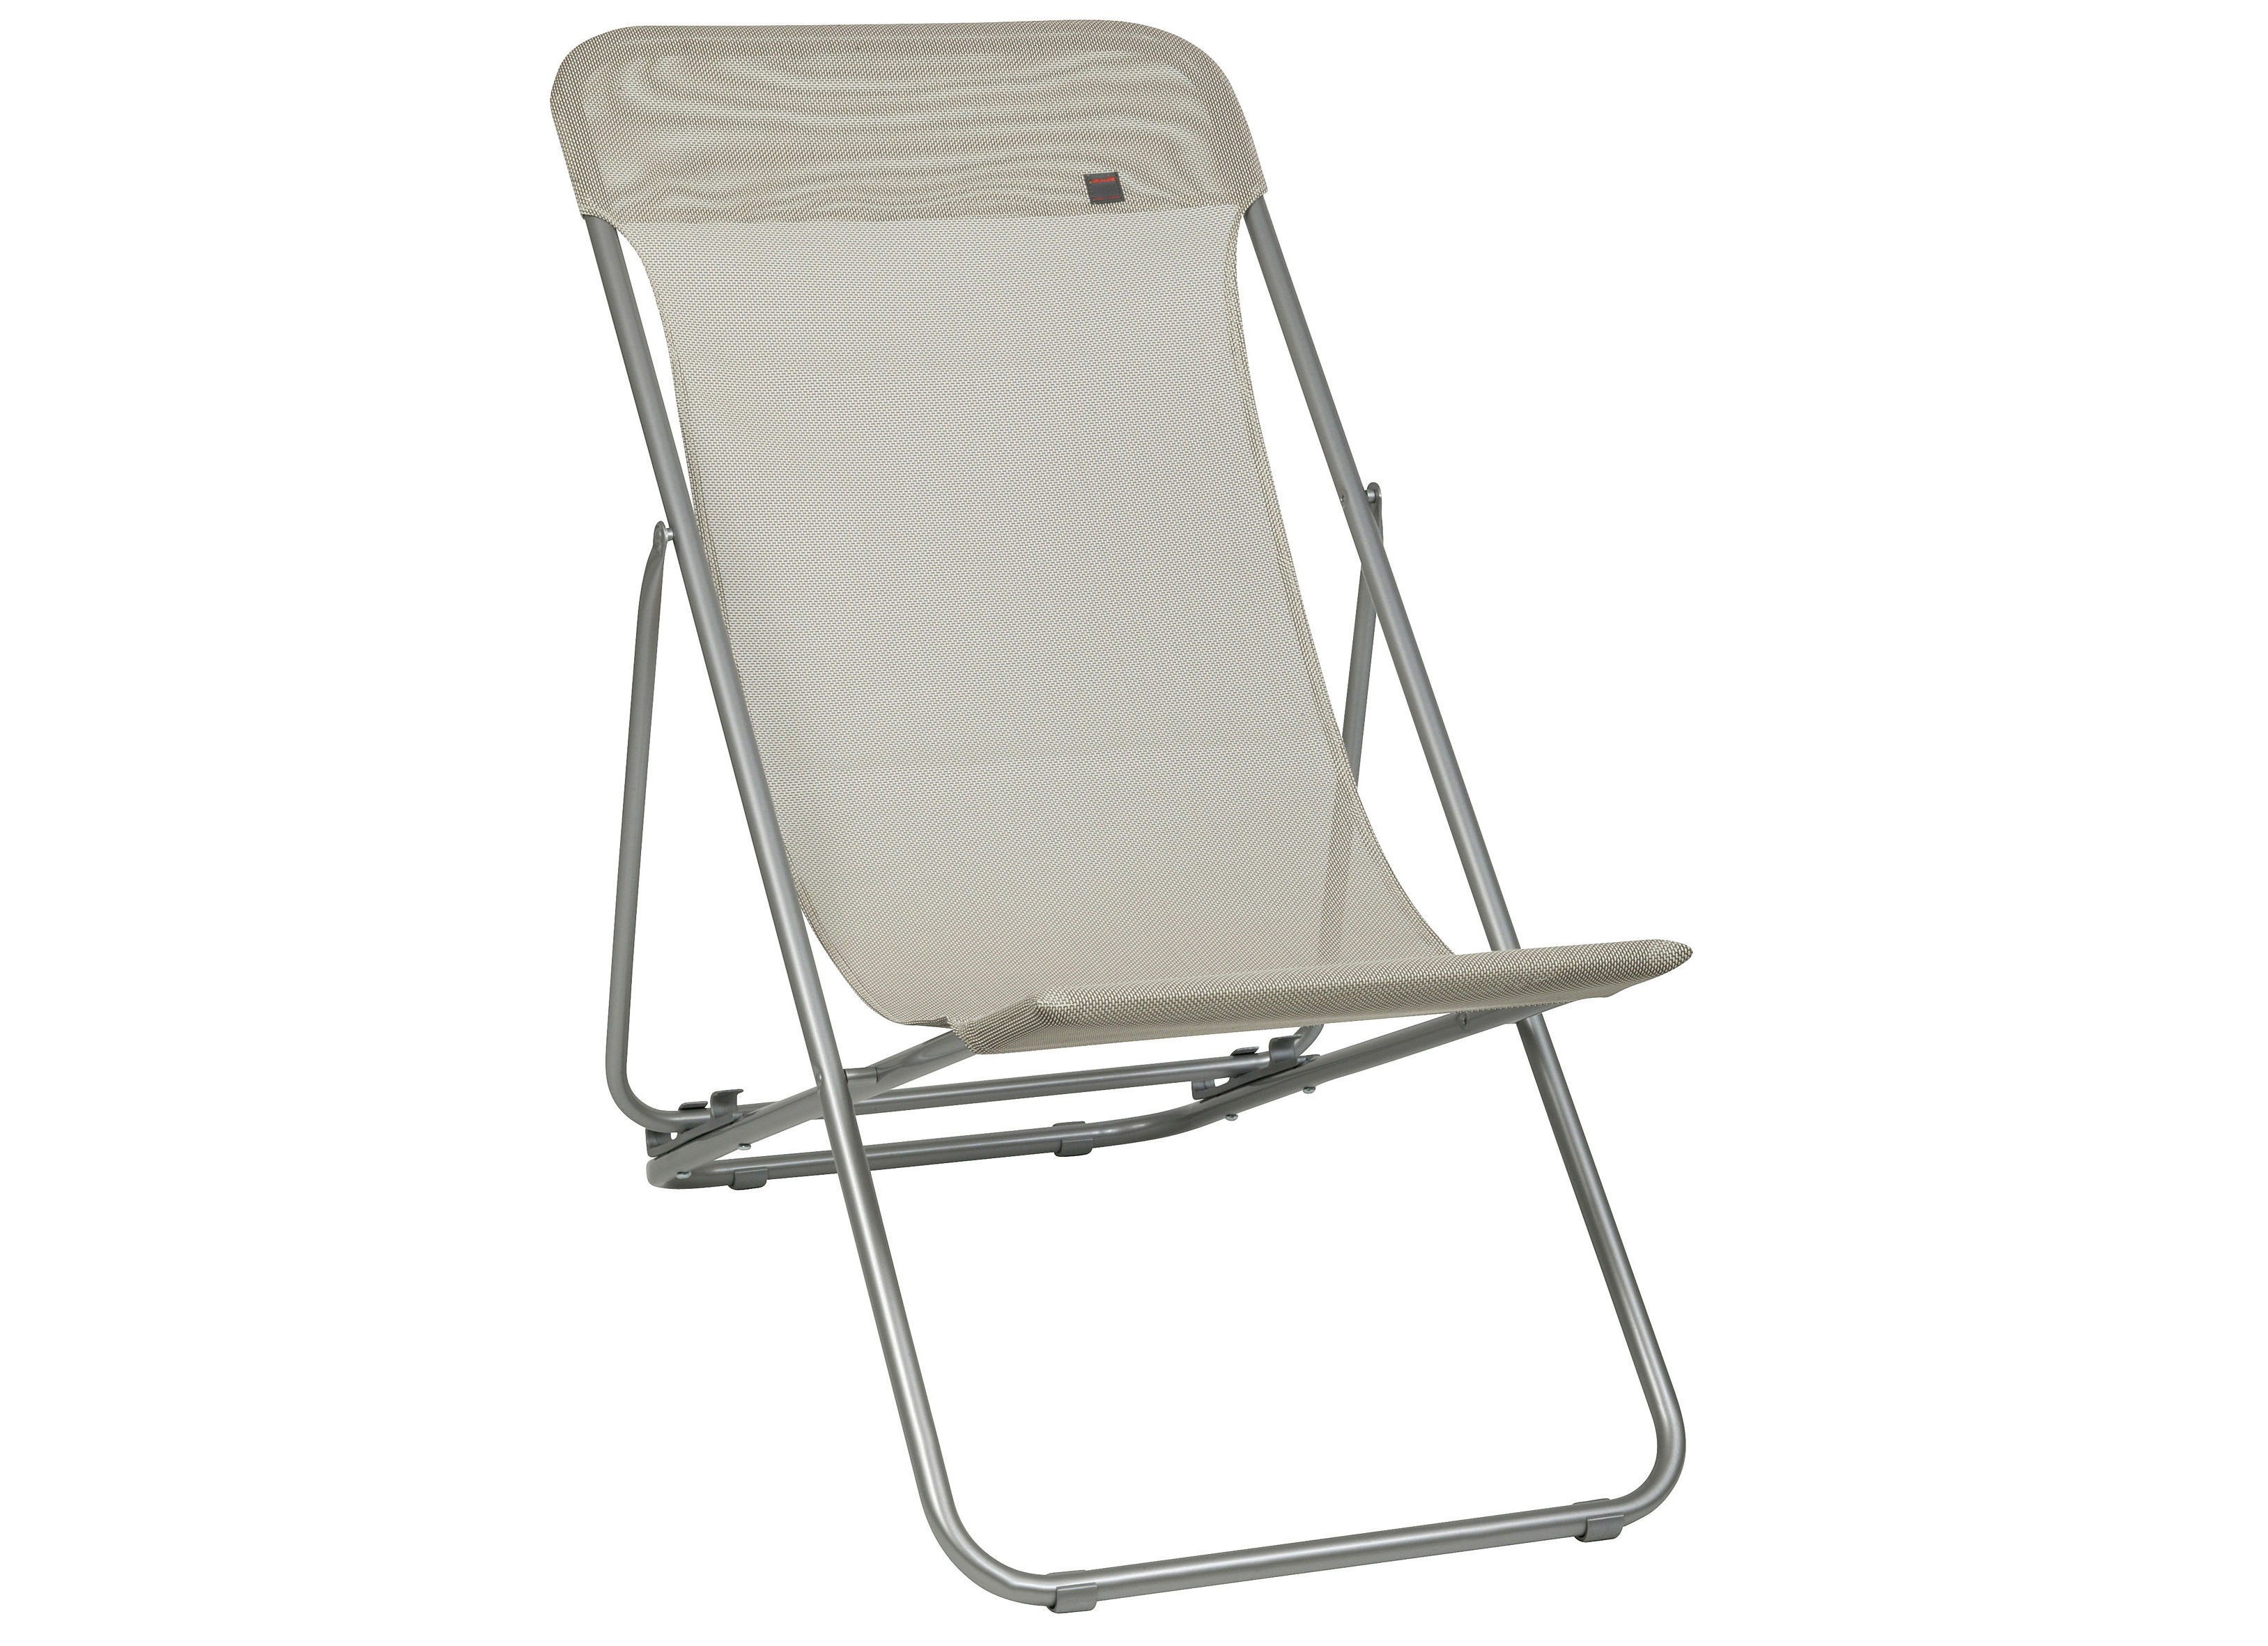 Chaise longue transatube pliable 3 positions seigle - Chaises longues lafuma ...